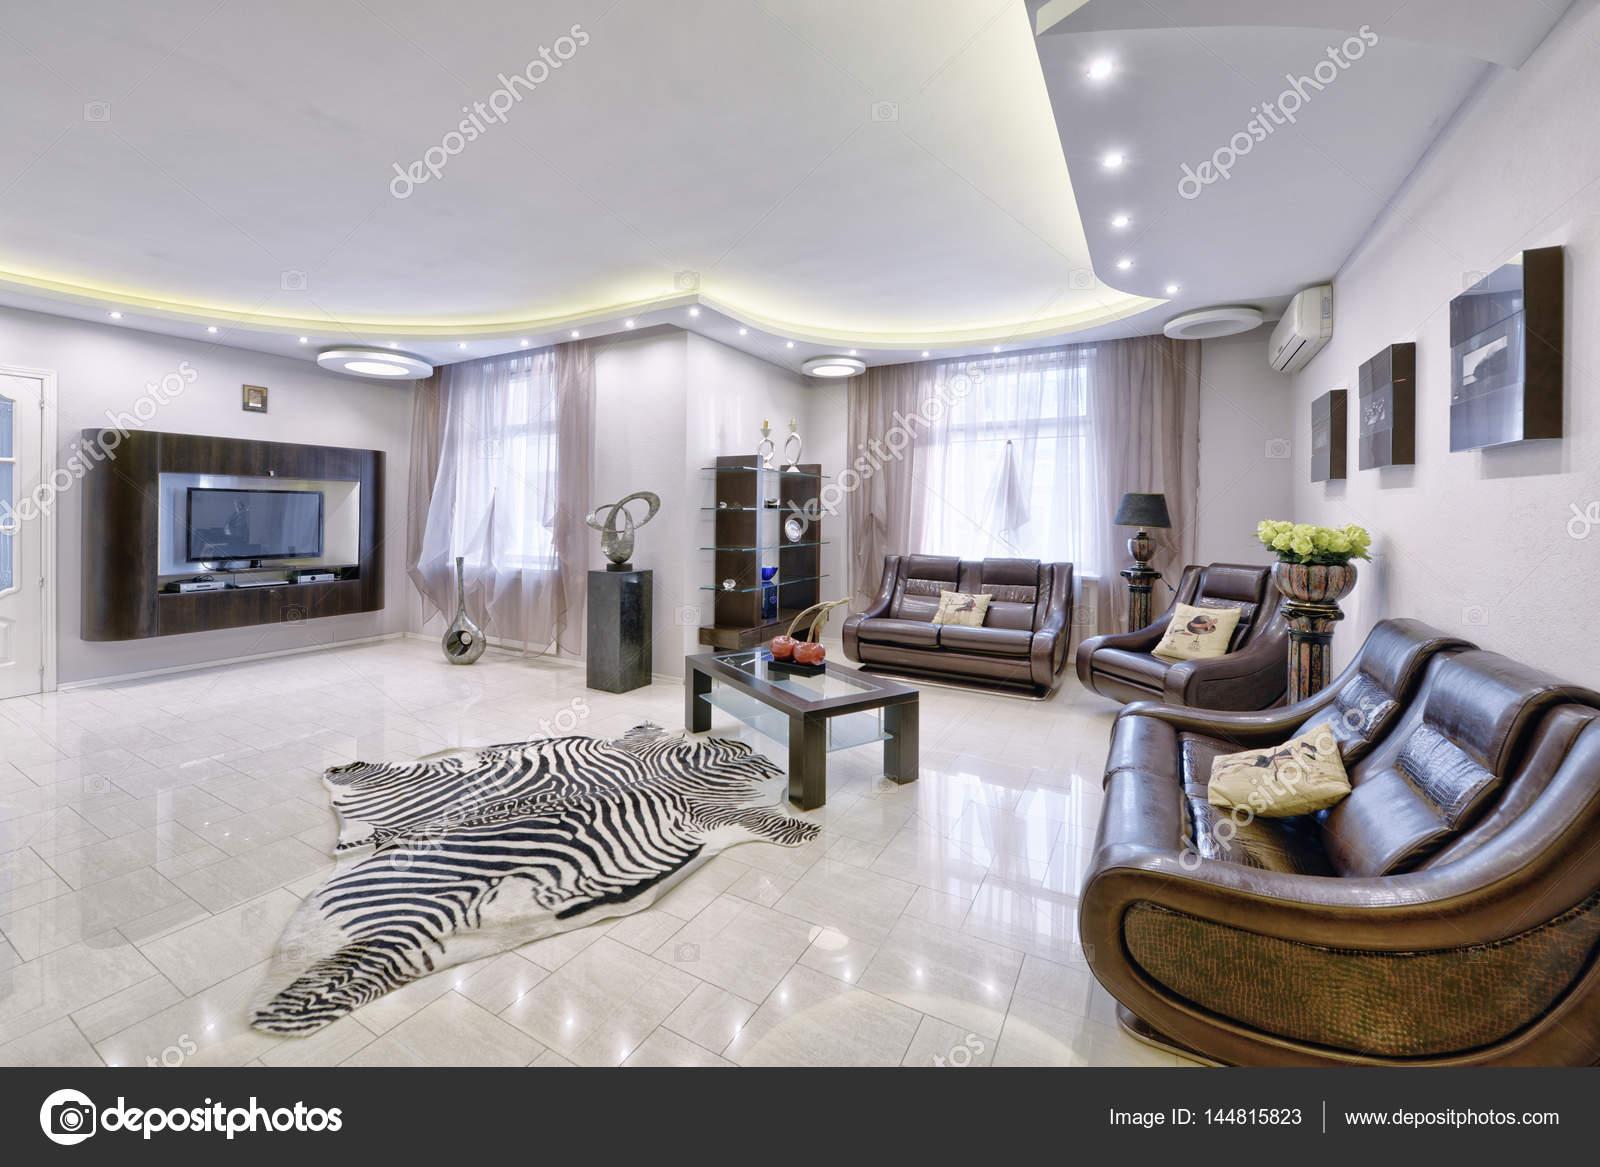 https://st3.depositphotos.com/4730441/14481/i/1600/depositphotos_144815823-stockafbeelding-modern-interieur-woonkamer-stedelijk-vastgoed.jpg